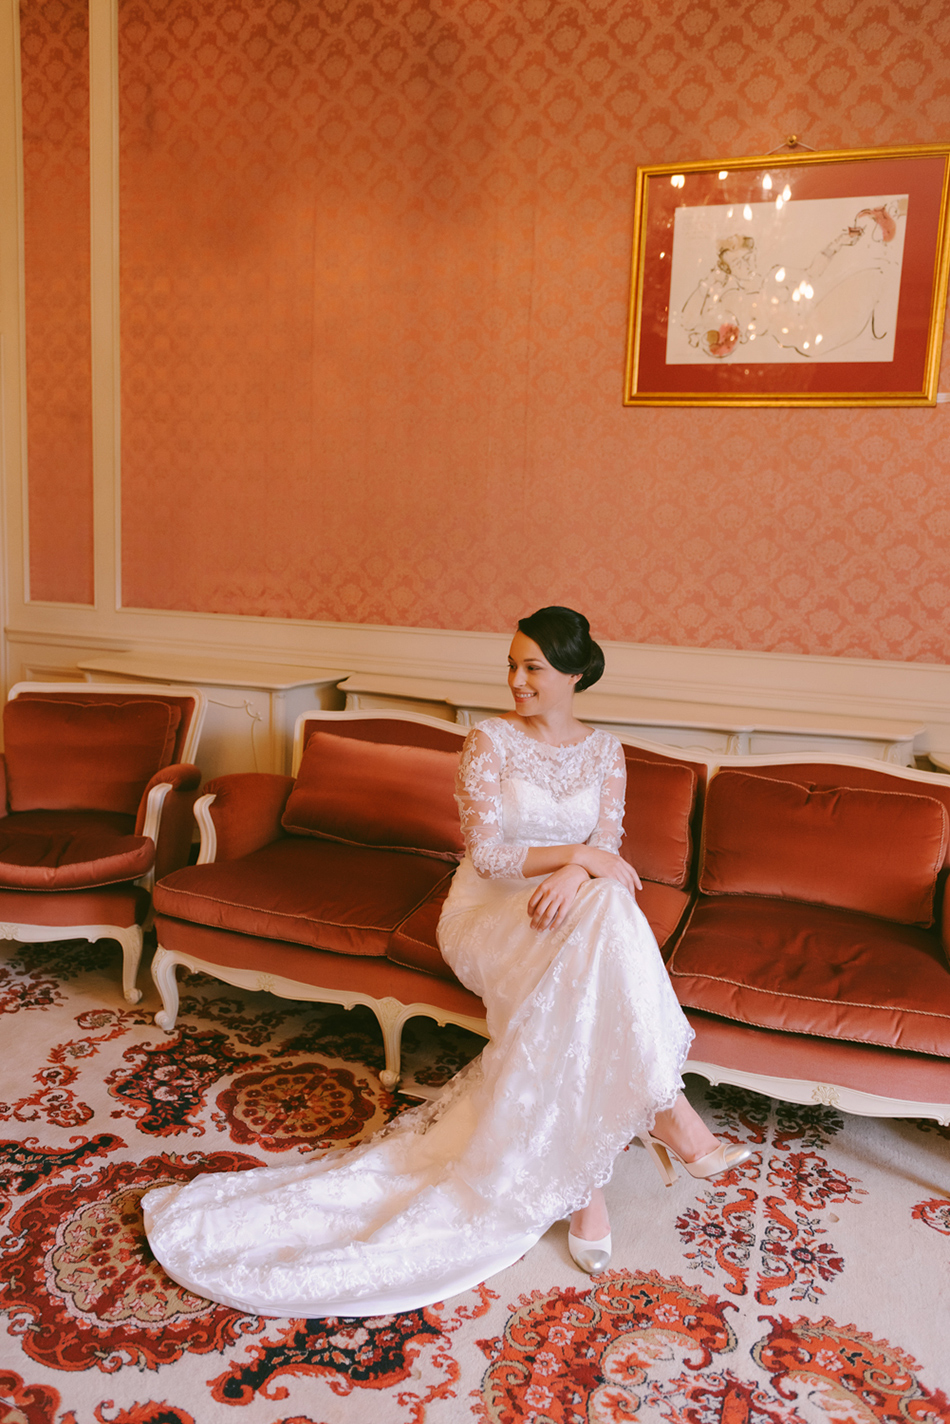 AD Passion Photography | fotograf-nunta-sinaia-flo-oana_0030 | Adelin, Dida, fotograf profesionist, fotograf de nunta, fotografie de nunta, fotograf Timisoara, fotograf Craiova, fotograf Bucuresti, fotograf Arad, nunta Timisoara, nunta Arad, nunta Bucuresti, nunta Craiova